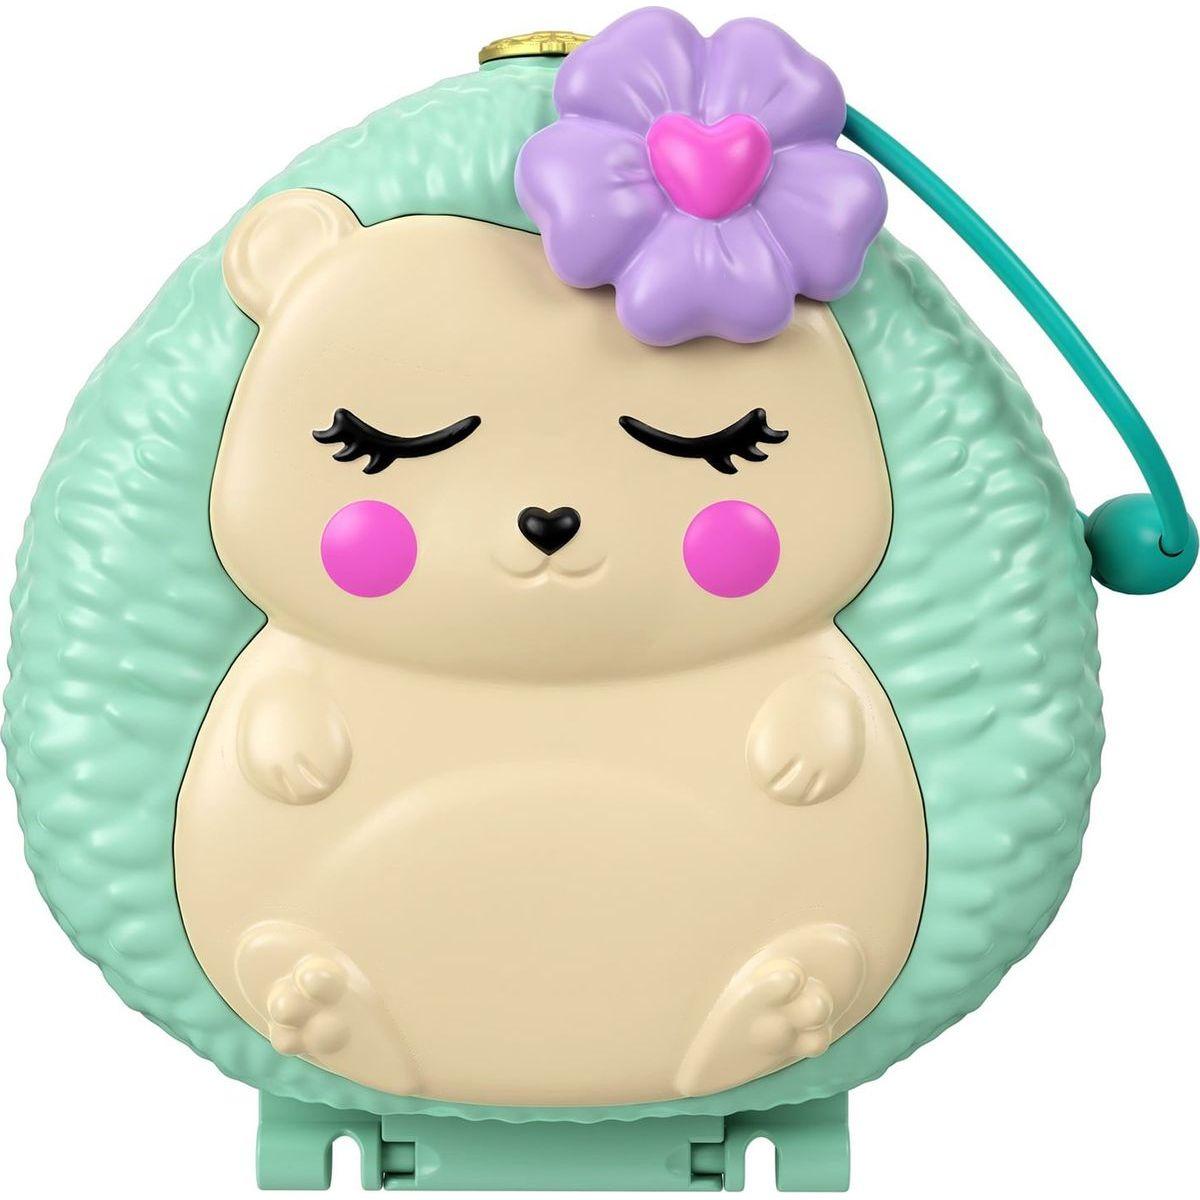 Mattel Polly Pocket pidi svet do vrecka ježia kaviareň